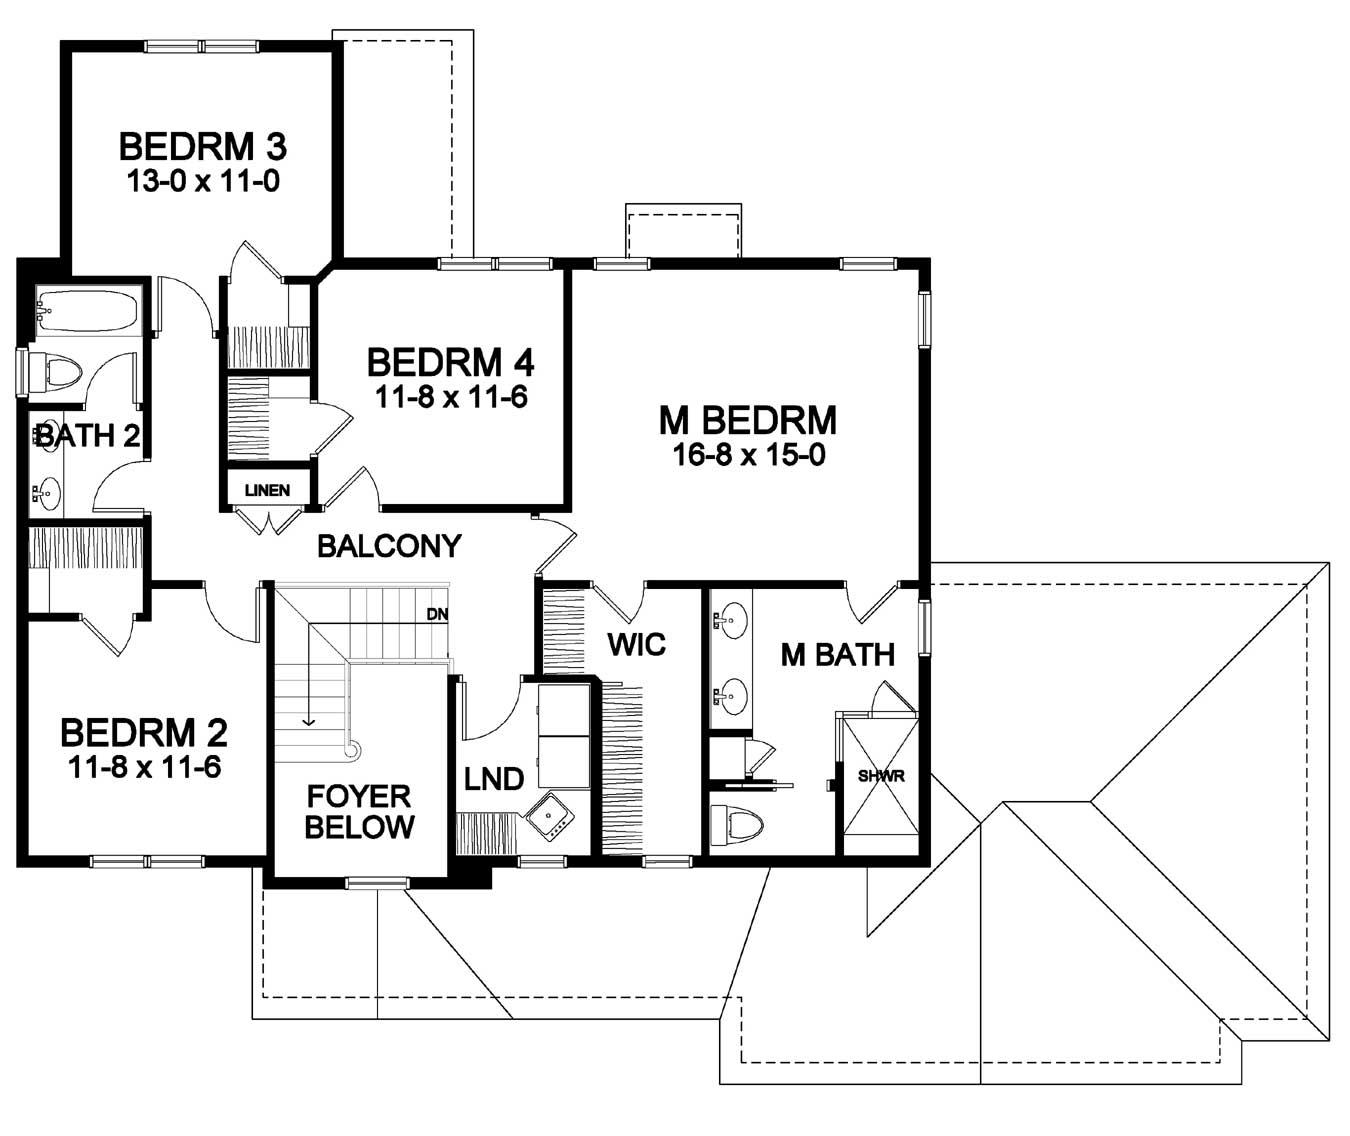 four bedrooms on second floor